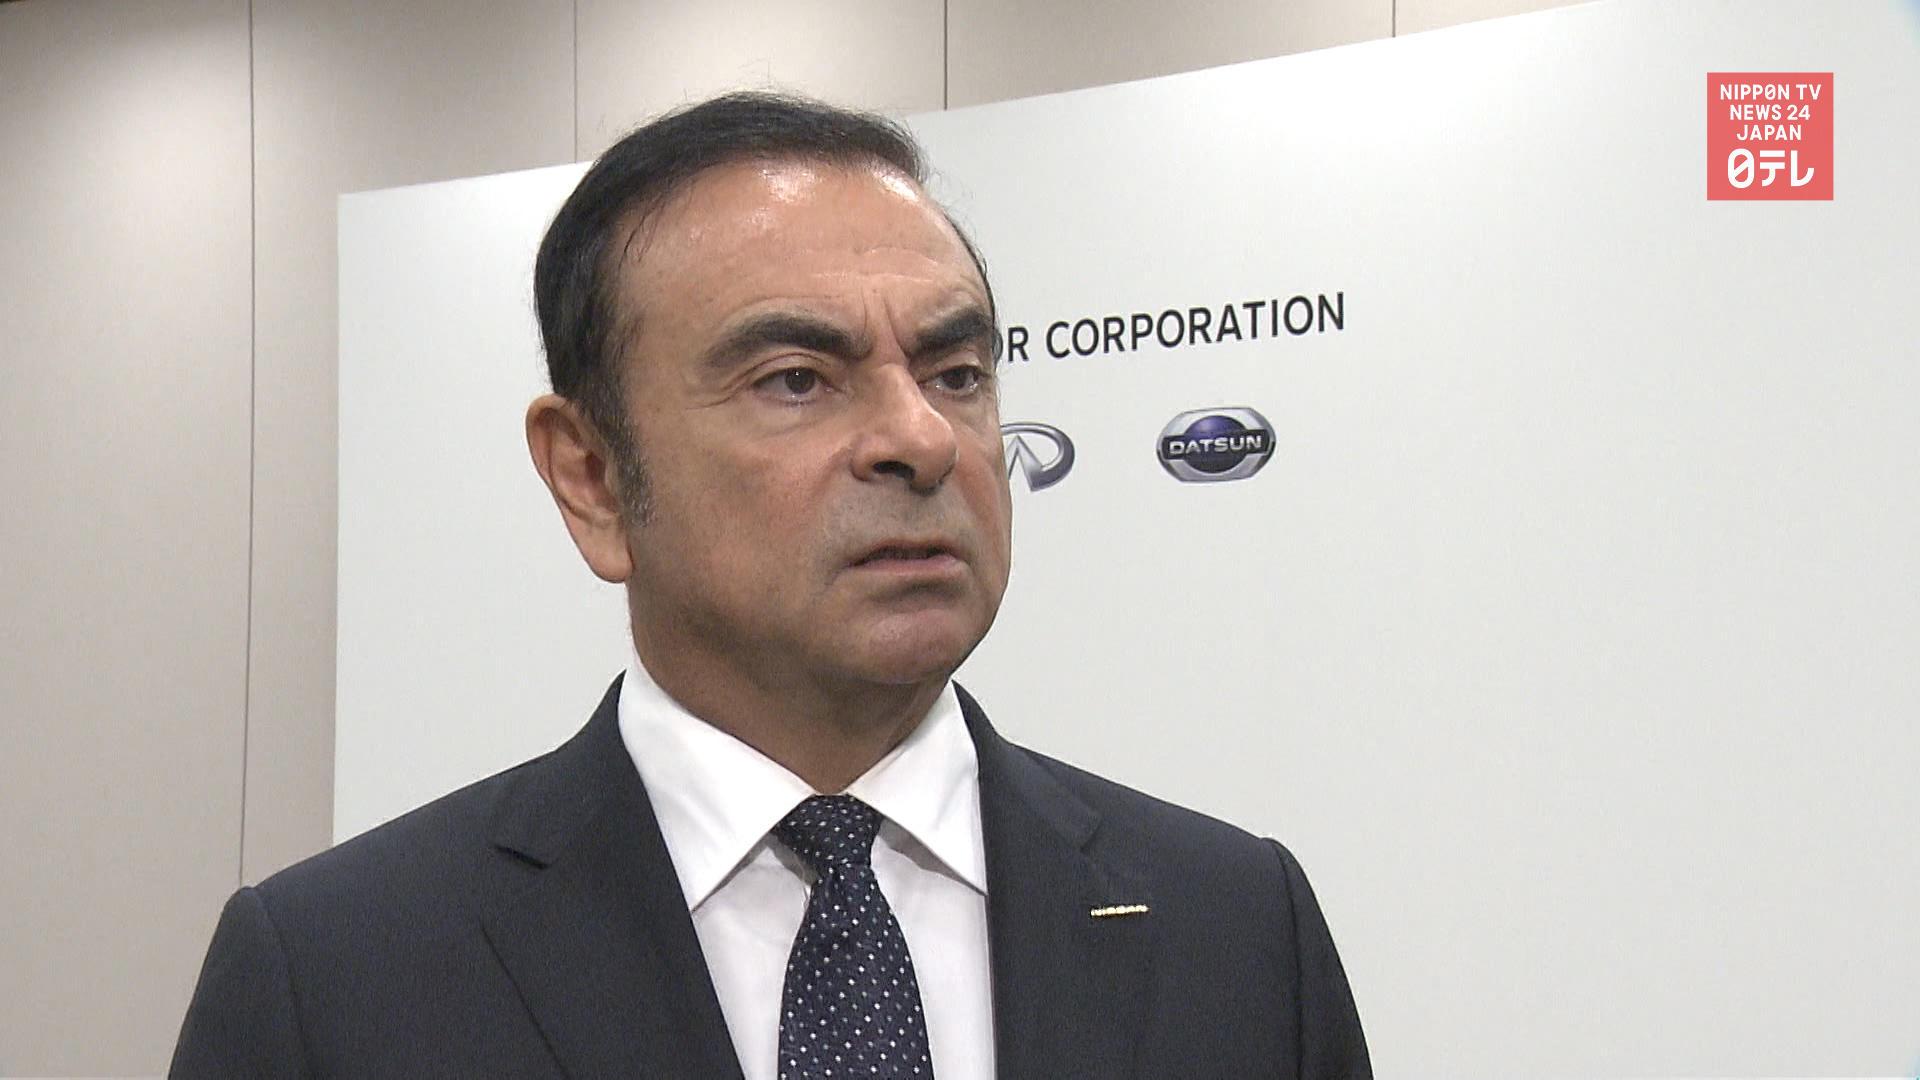 Prosecutors search Ghosn's Tokyo residence